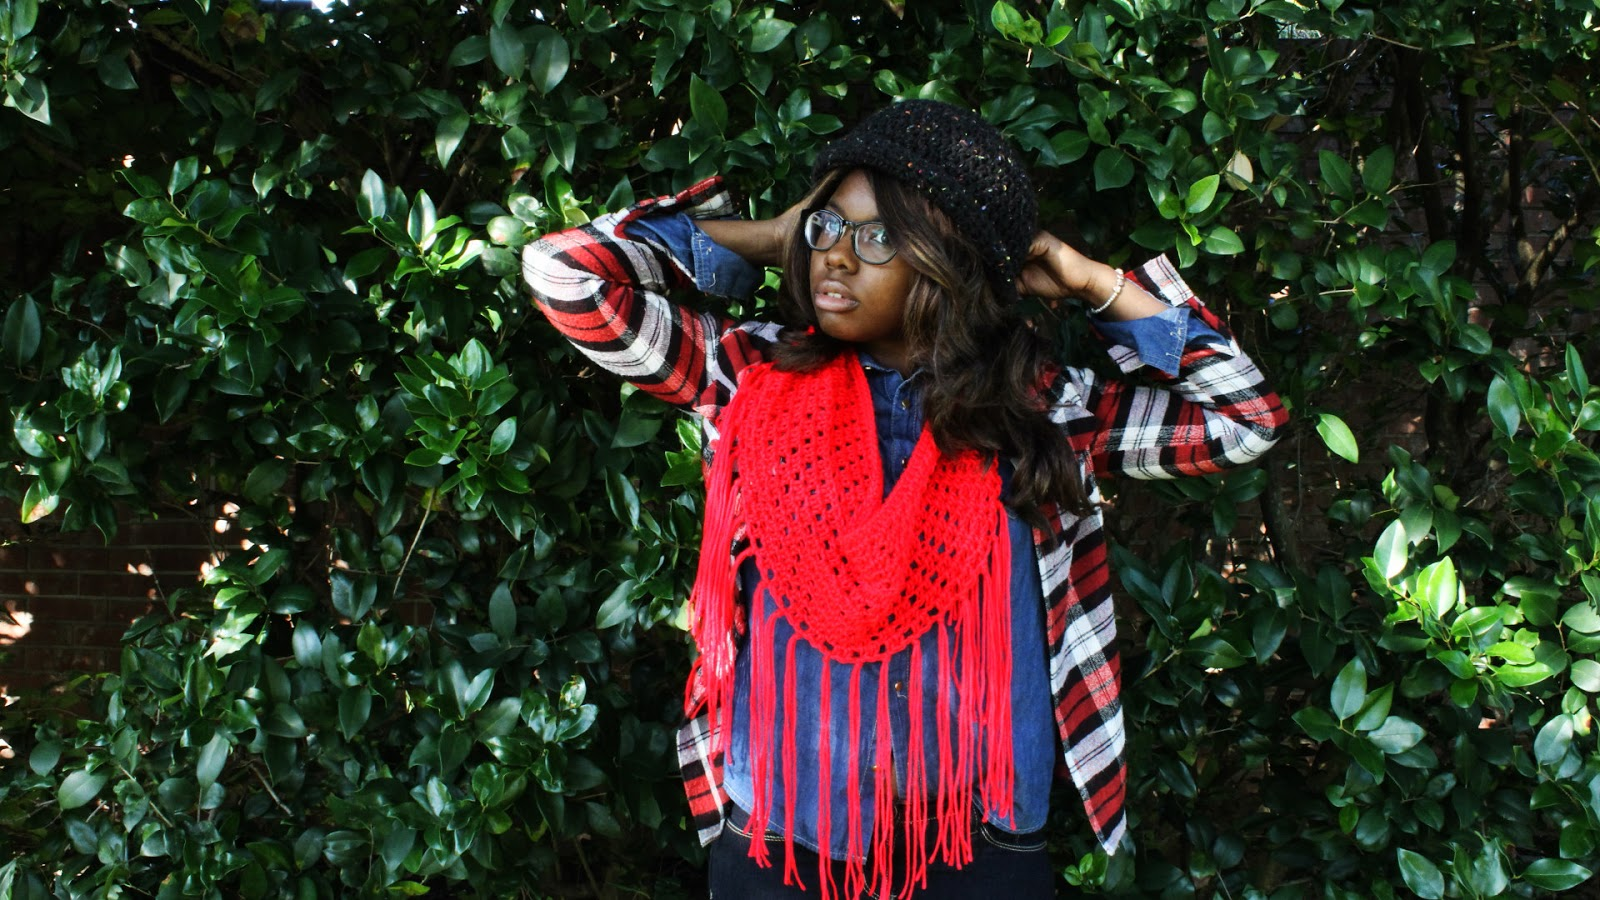 The Dream Crochet Blog Diy How To Crochet A Fringe Infinity Scarf